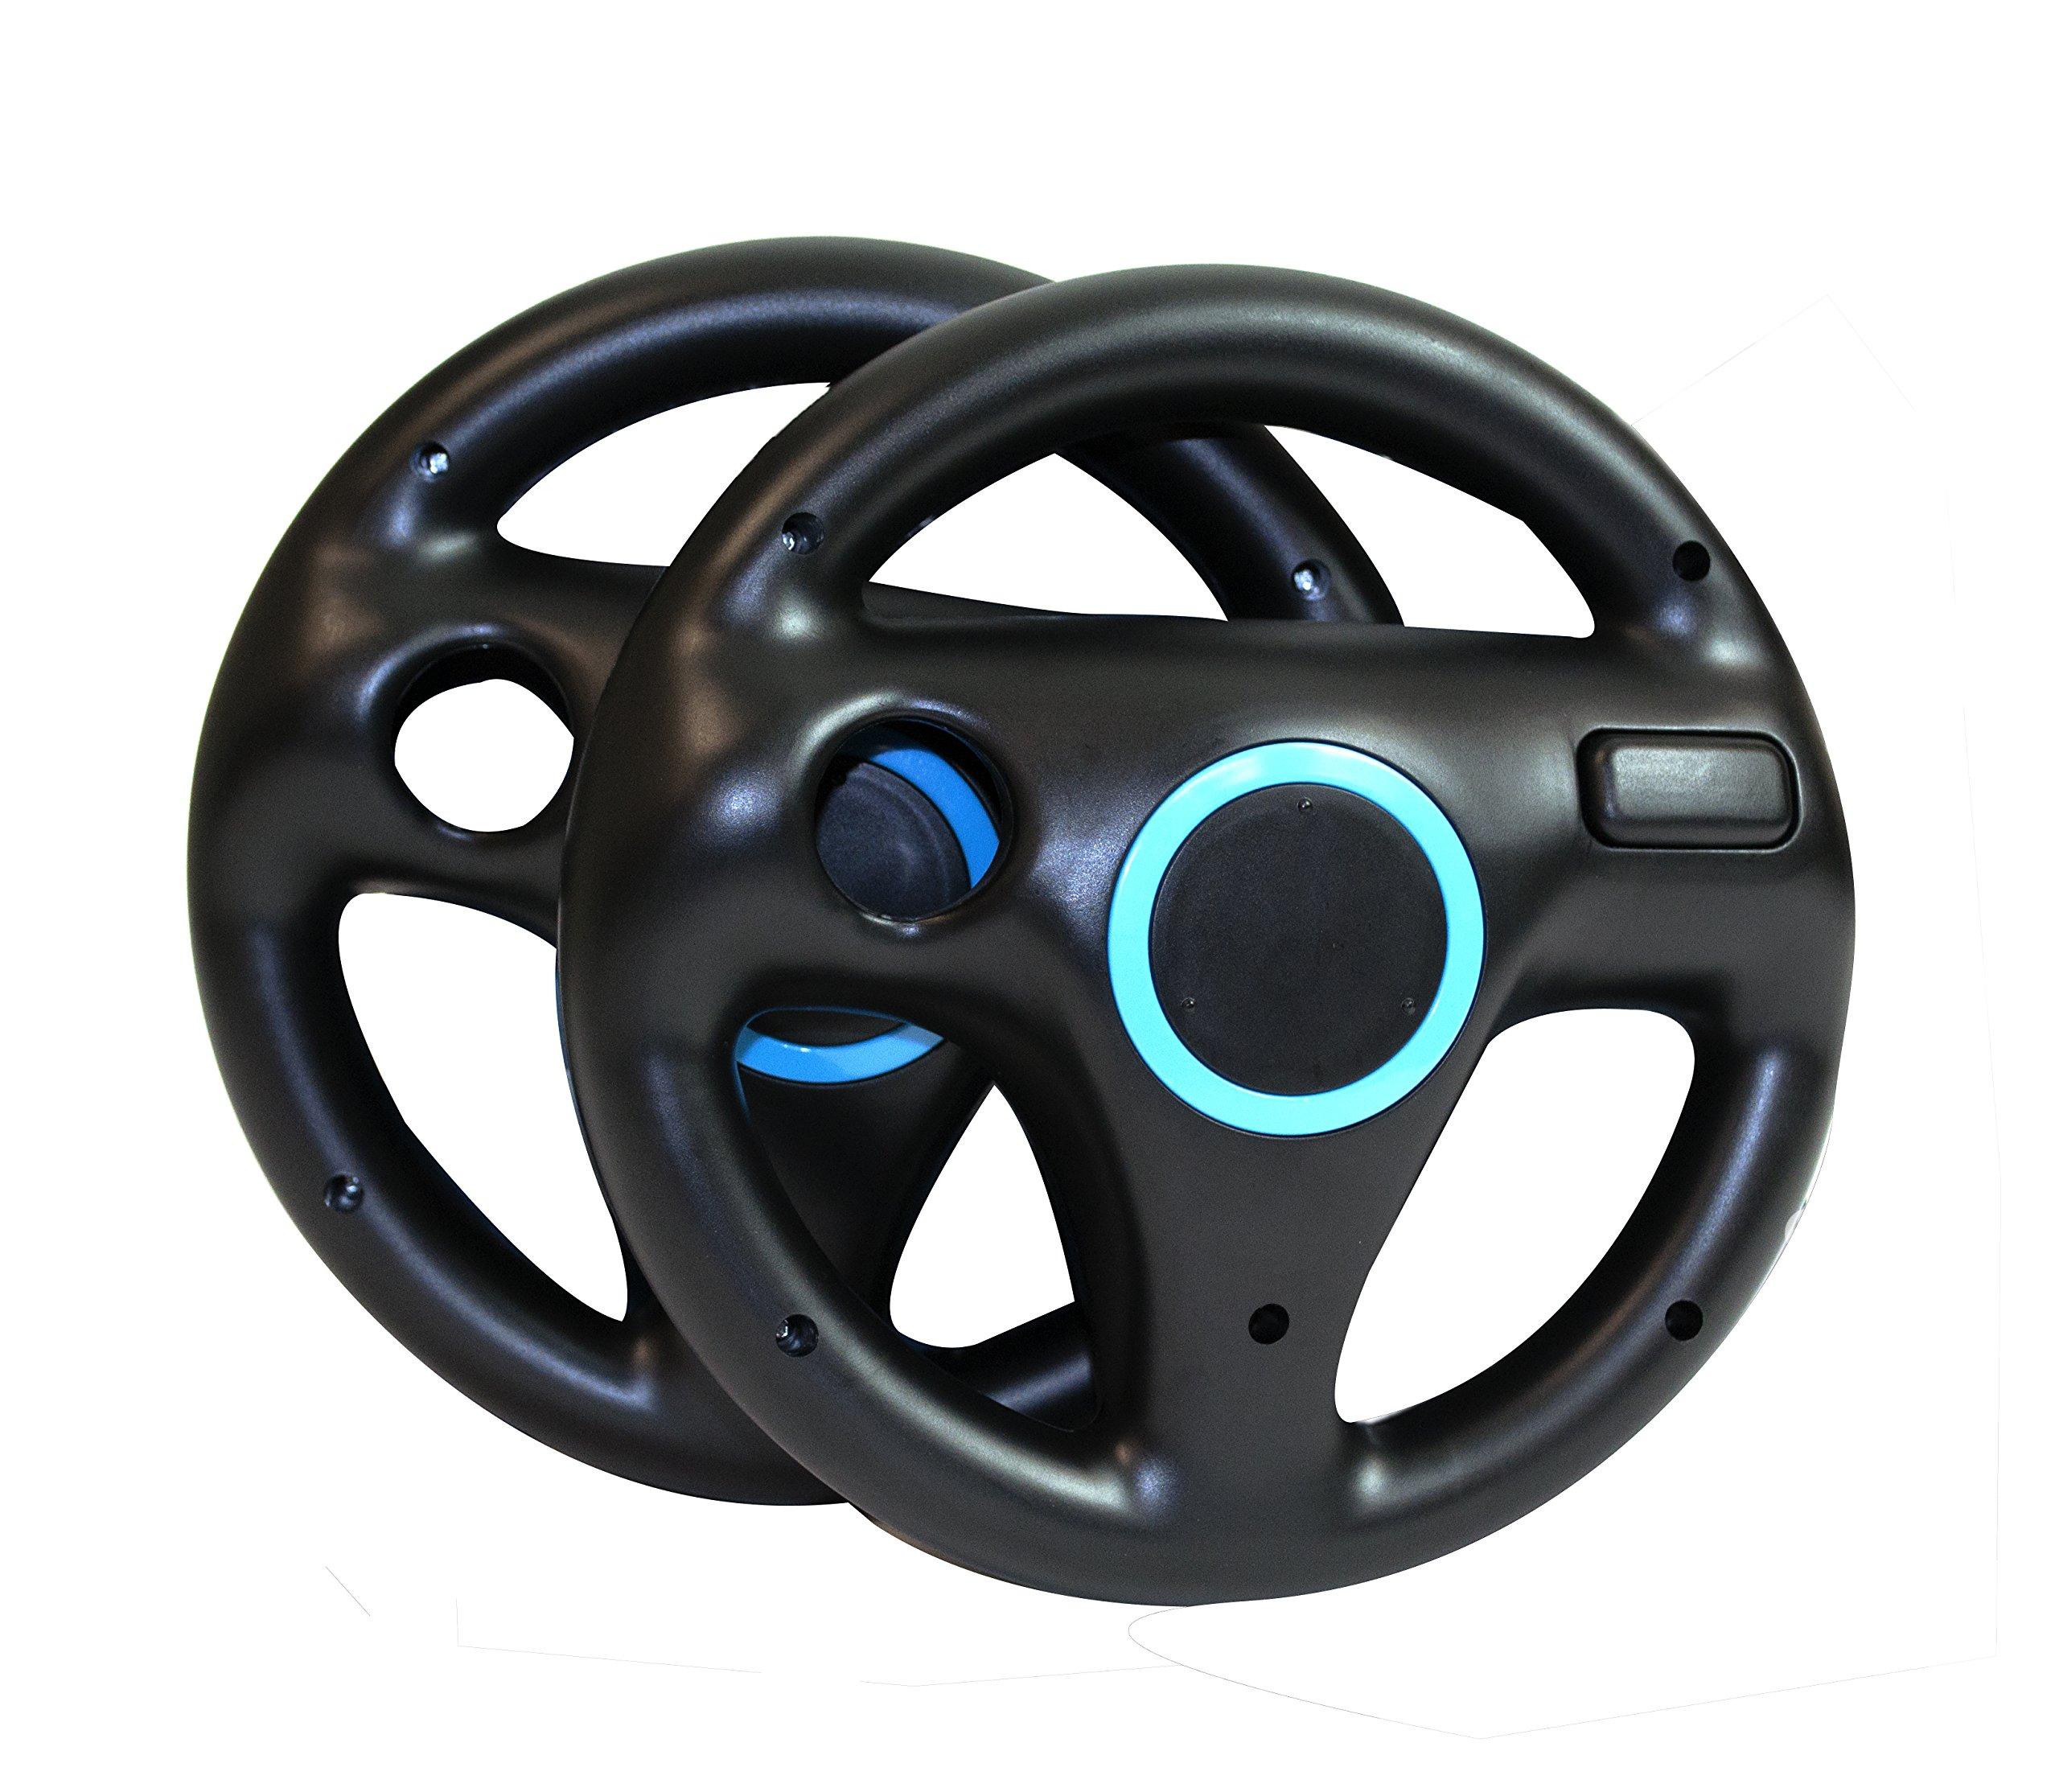 Beastron Mario Kart Racing Wheel for Nintendo Wii, 2 Sets Black Color Bundle